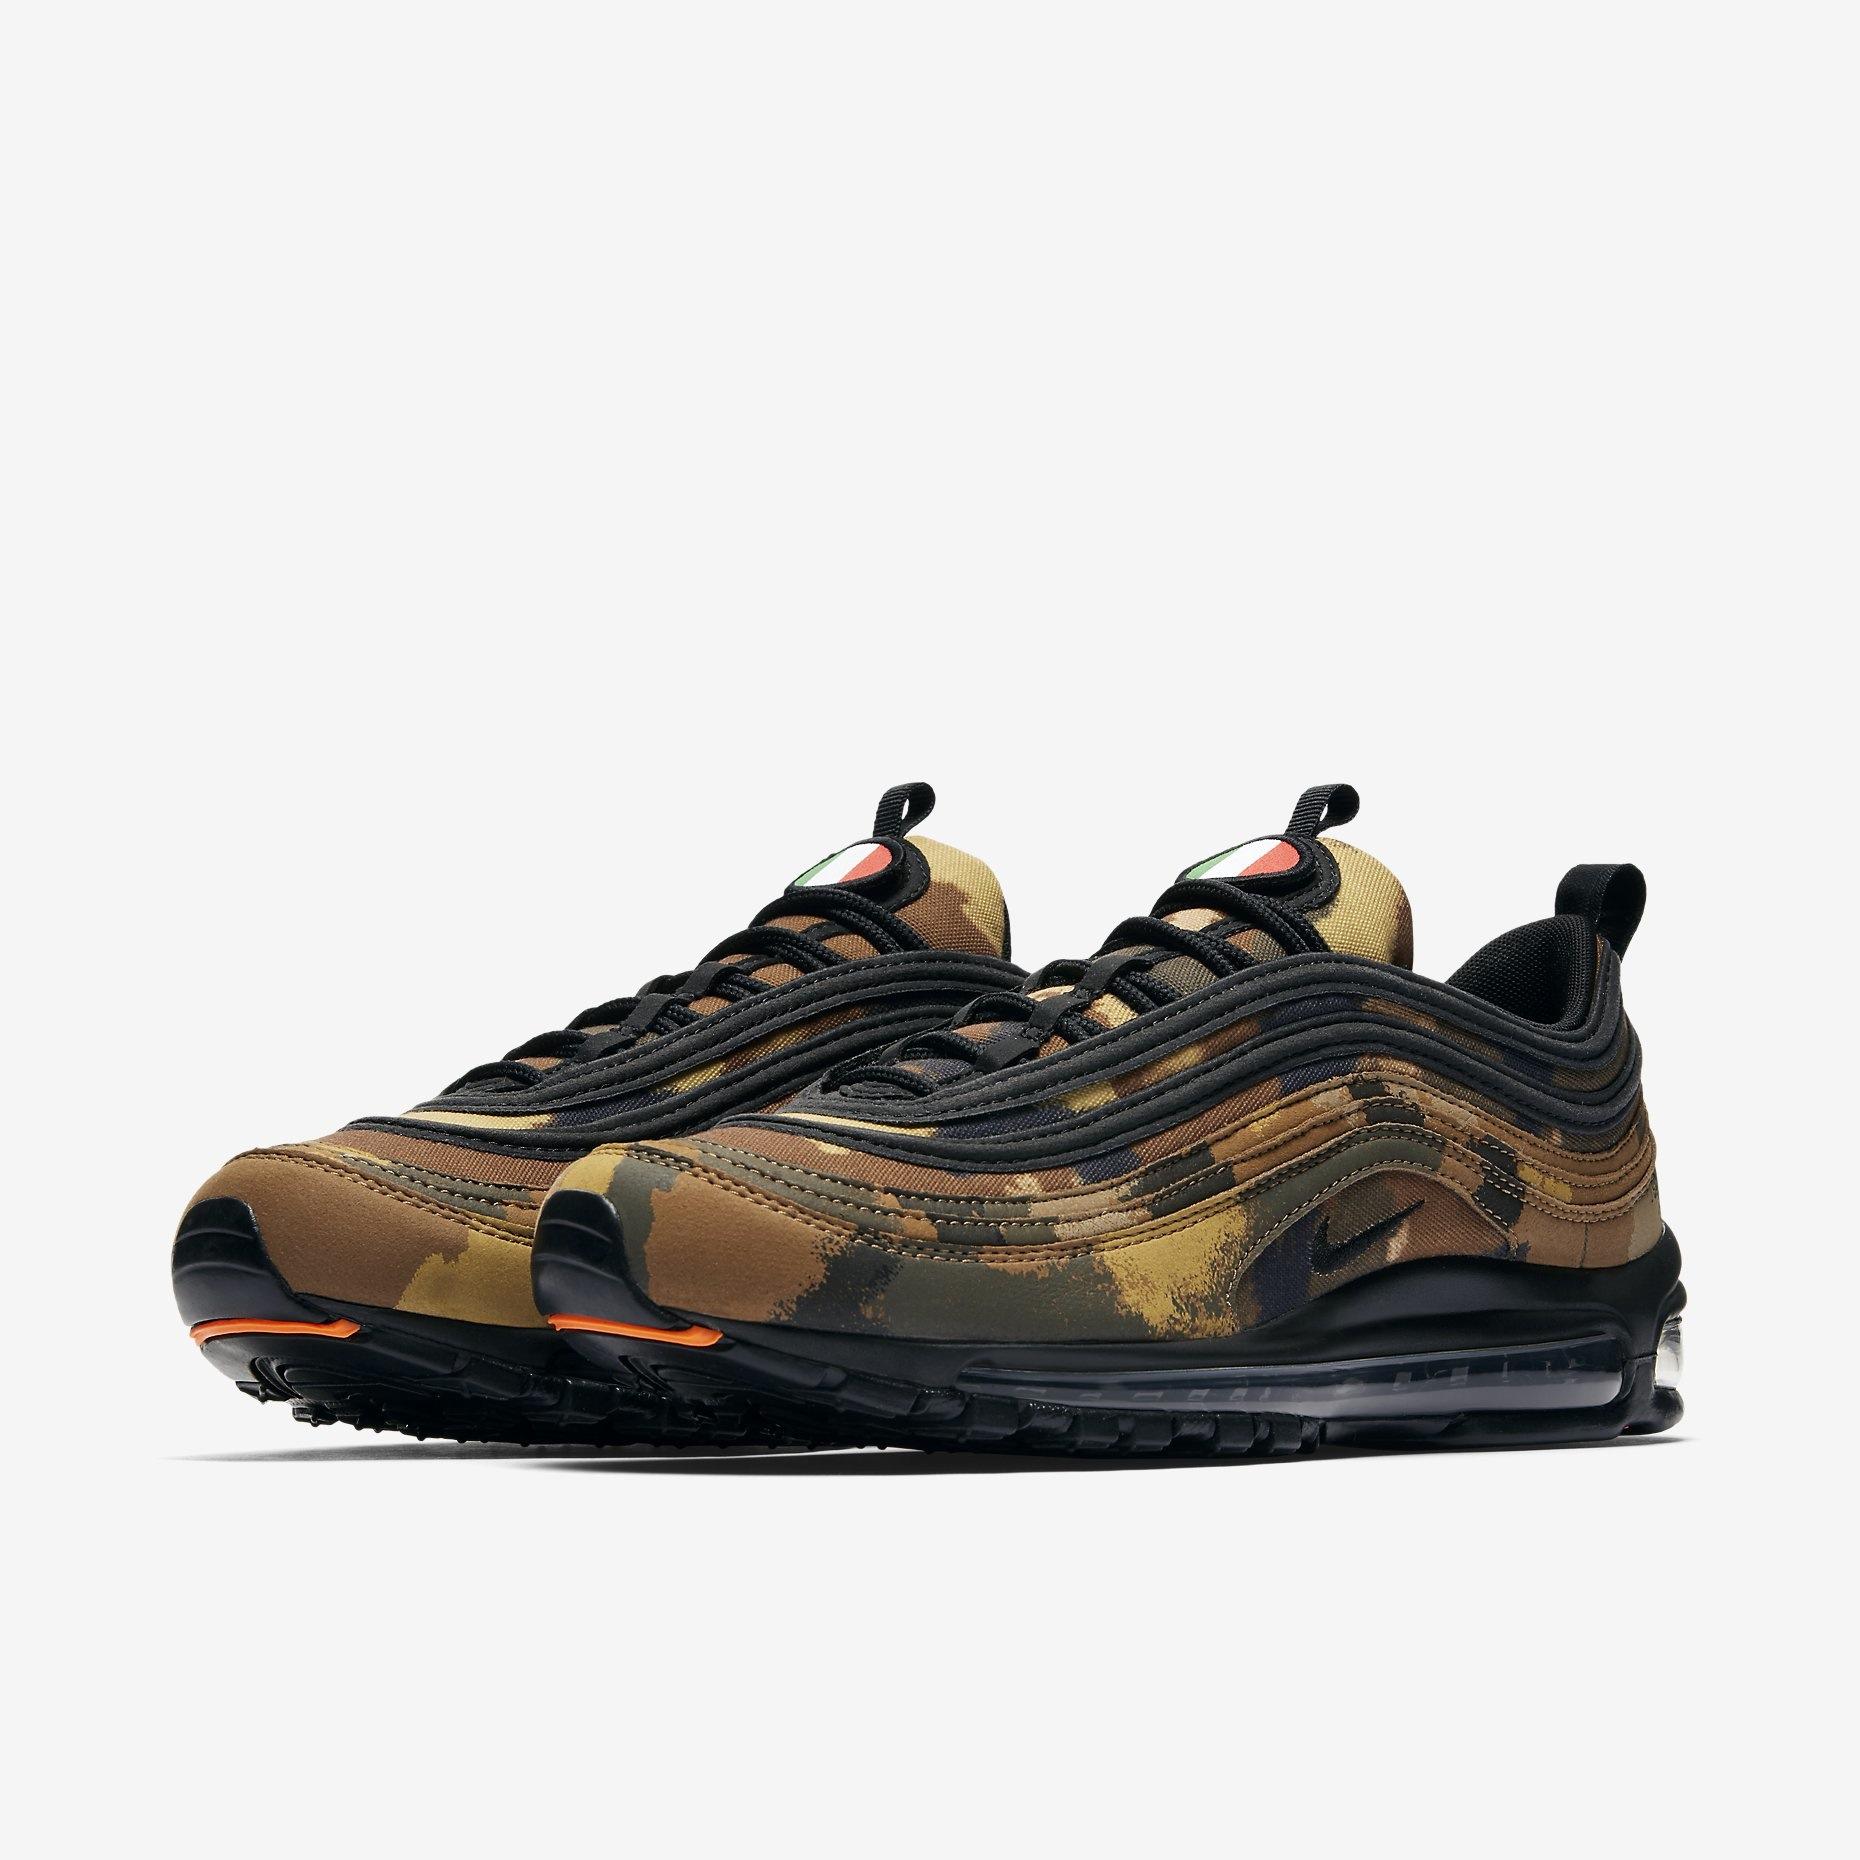 3be19347 Nike Air Max 97 Camo Germany. Coloris : Bamboo/Black-Dark Khaki-Sequoia SKU  Style Code : AJ2614-204. Date de sortie : décembre 2017. Prix : 180€